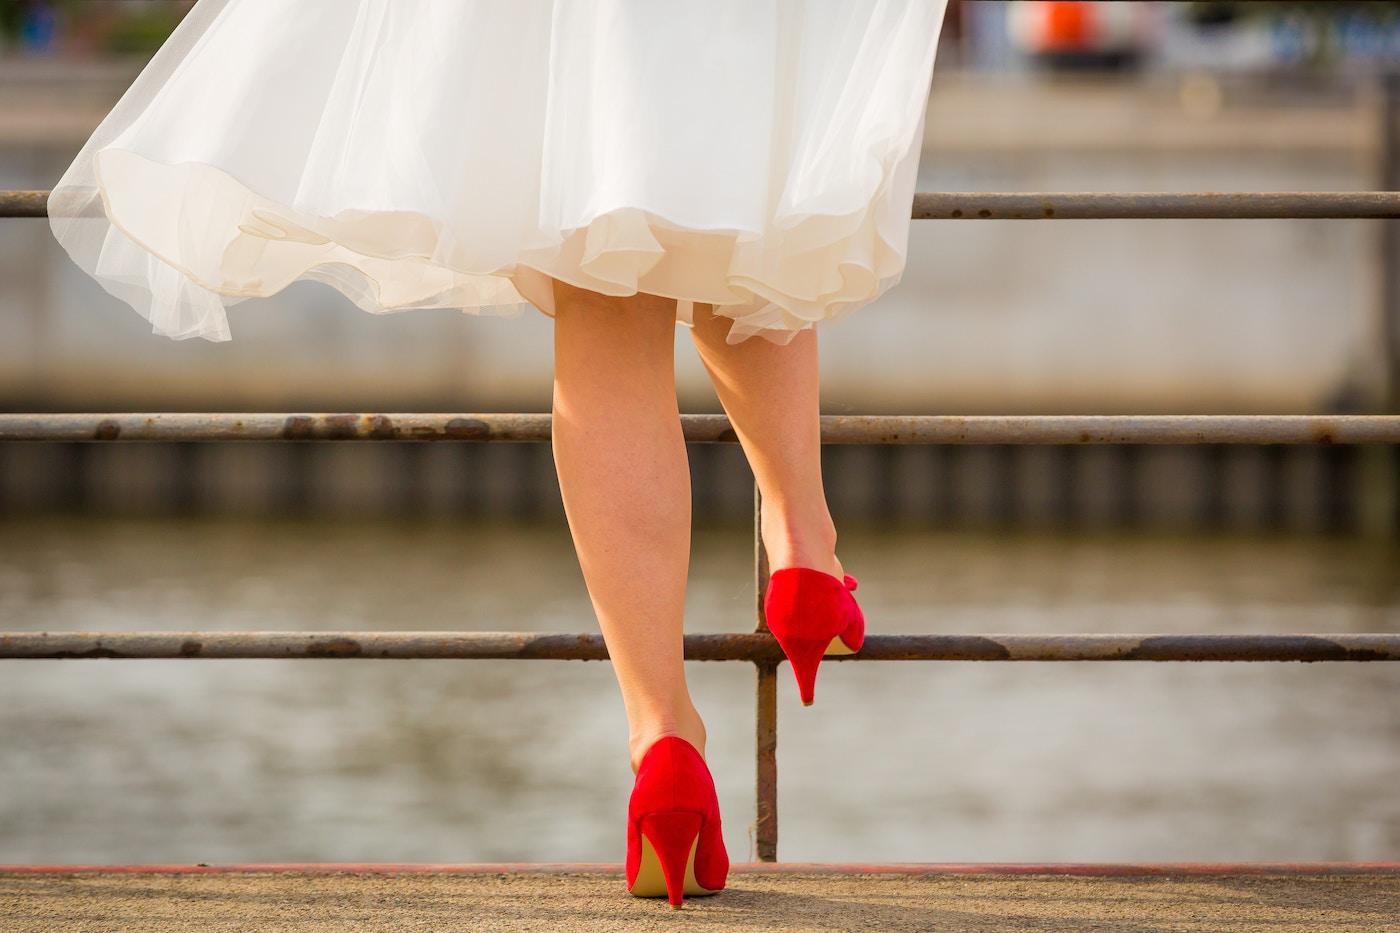 Український виробник жіночого одягу вийшов на ринок Канади